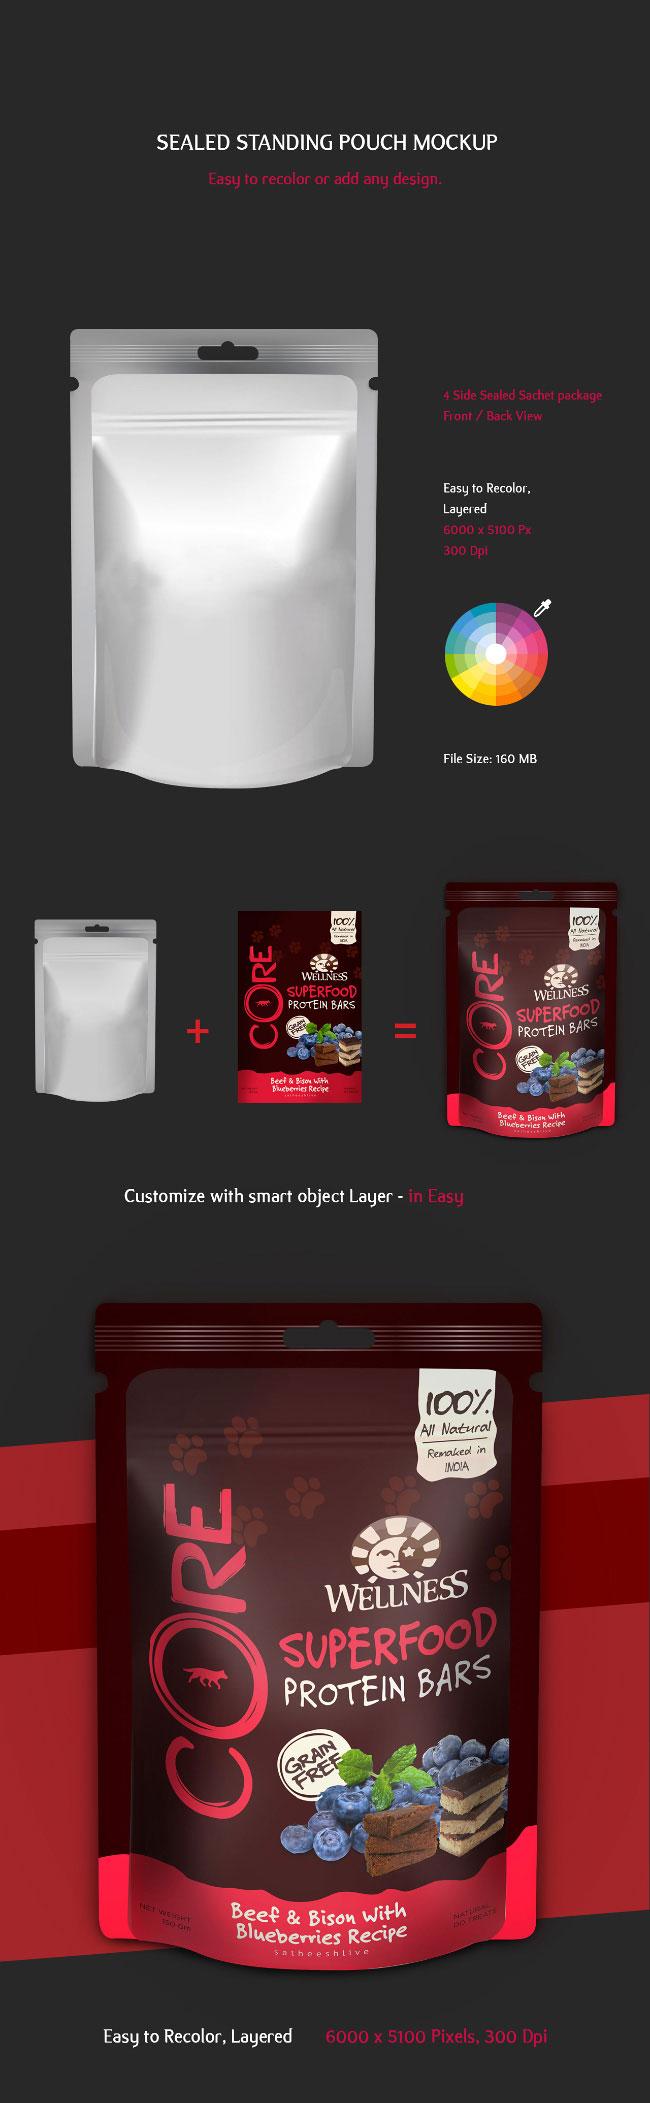 p423 - موکاپ ساندیس لایه باز پاکت آبمیوه یا ادویه جات مواد غذایی